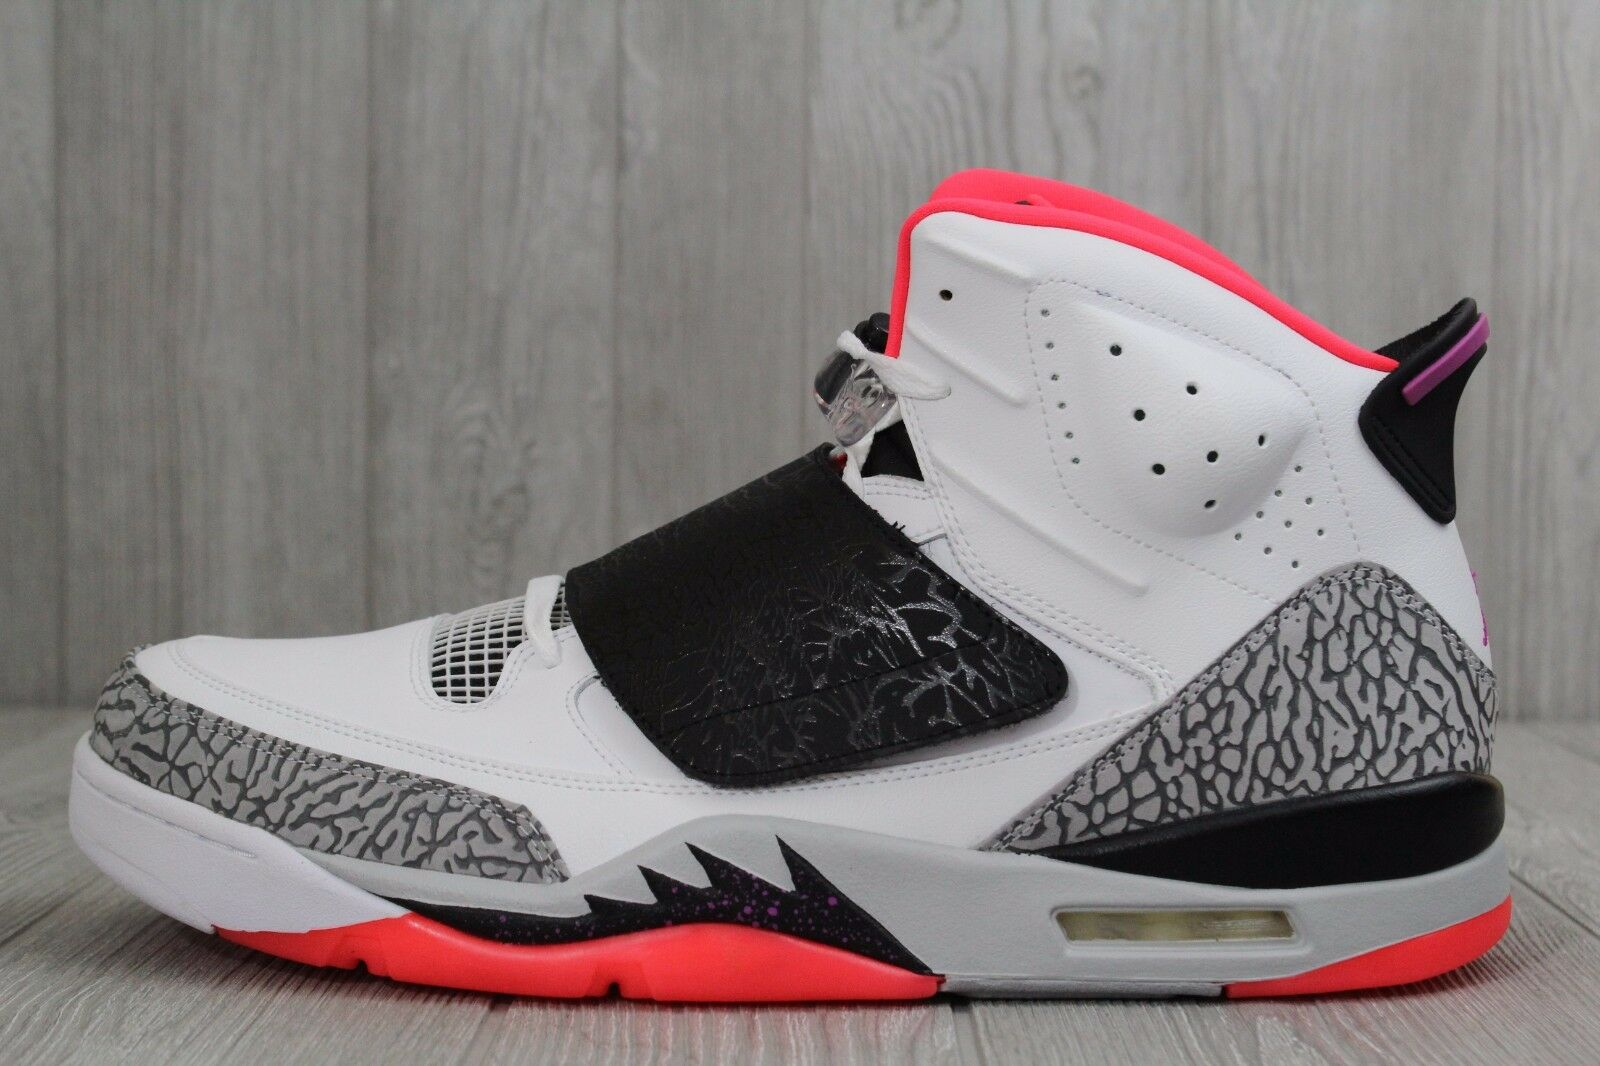 Nike Air Jordan Son of Mars Hot Lava Basketball Shoes 512245 105